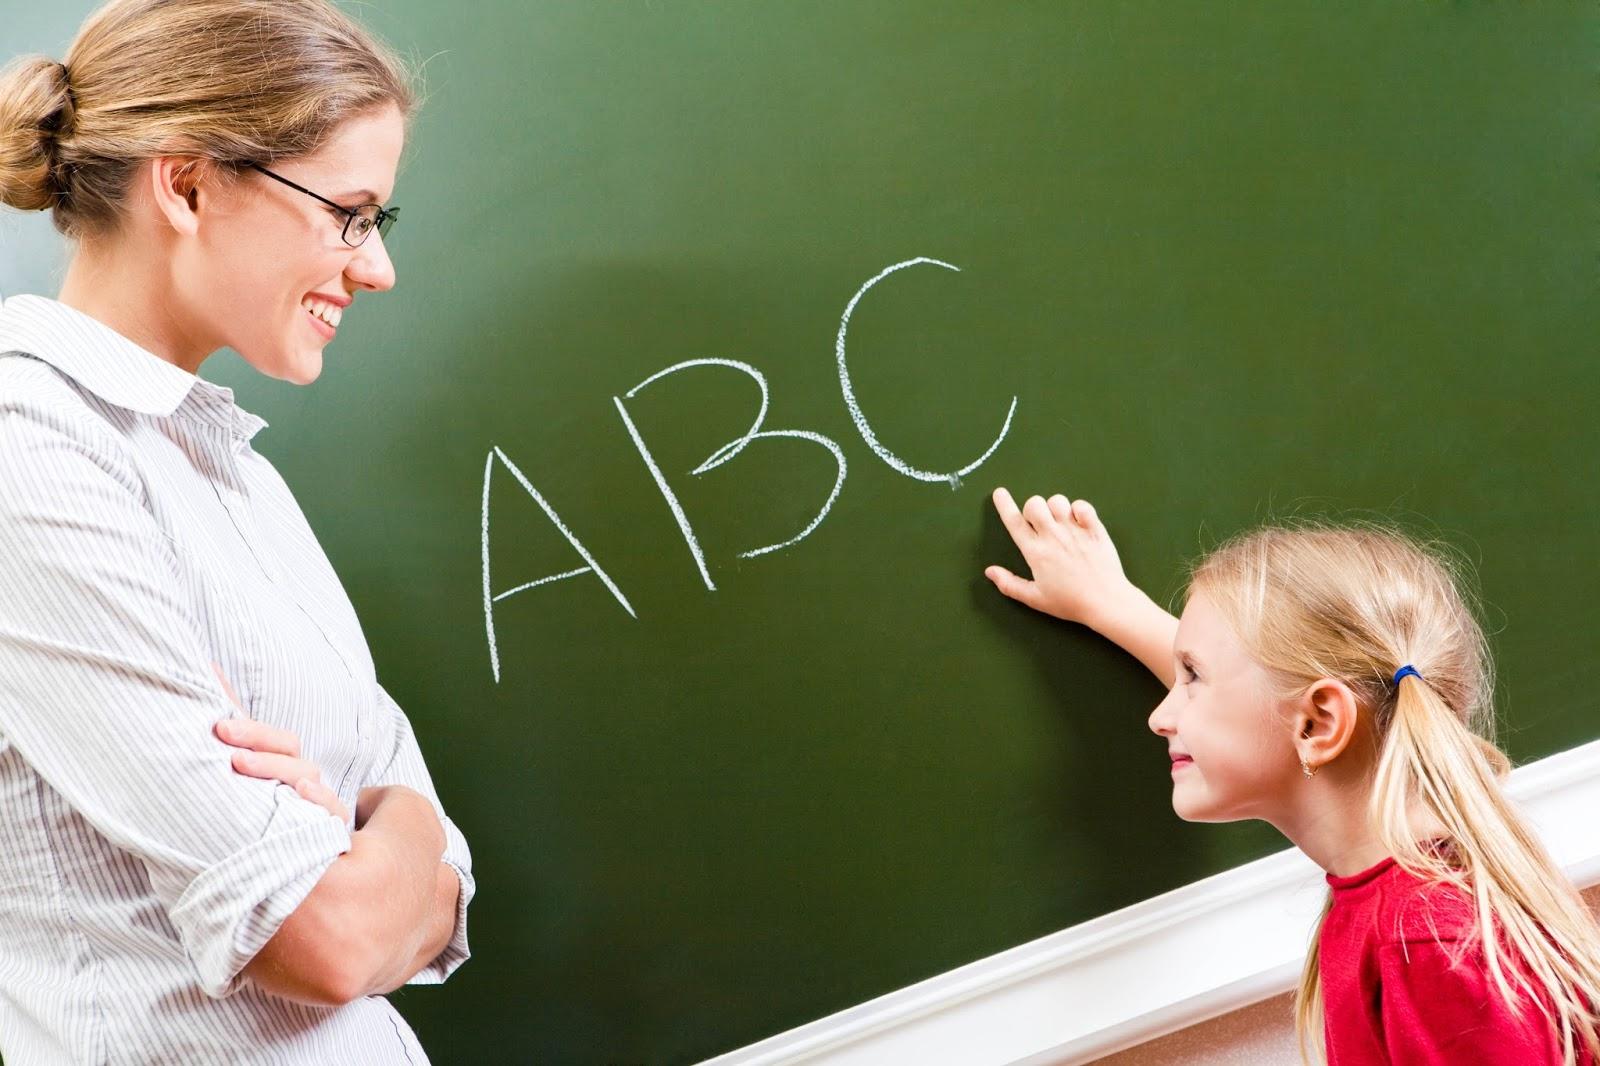 Arti Buang Angin Jika Di Artikan Oleh Para Guru